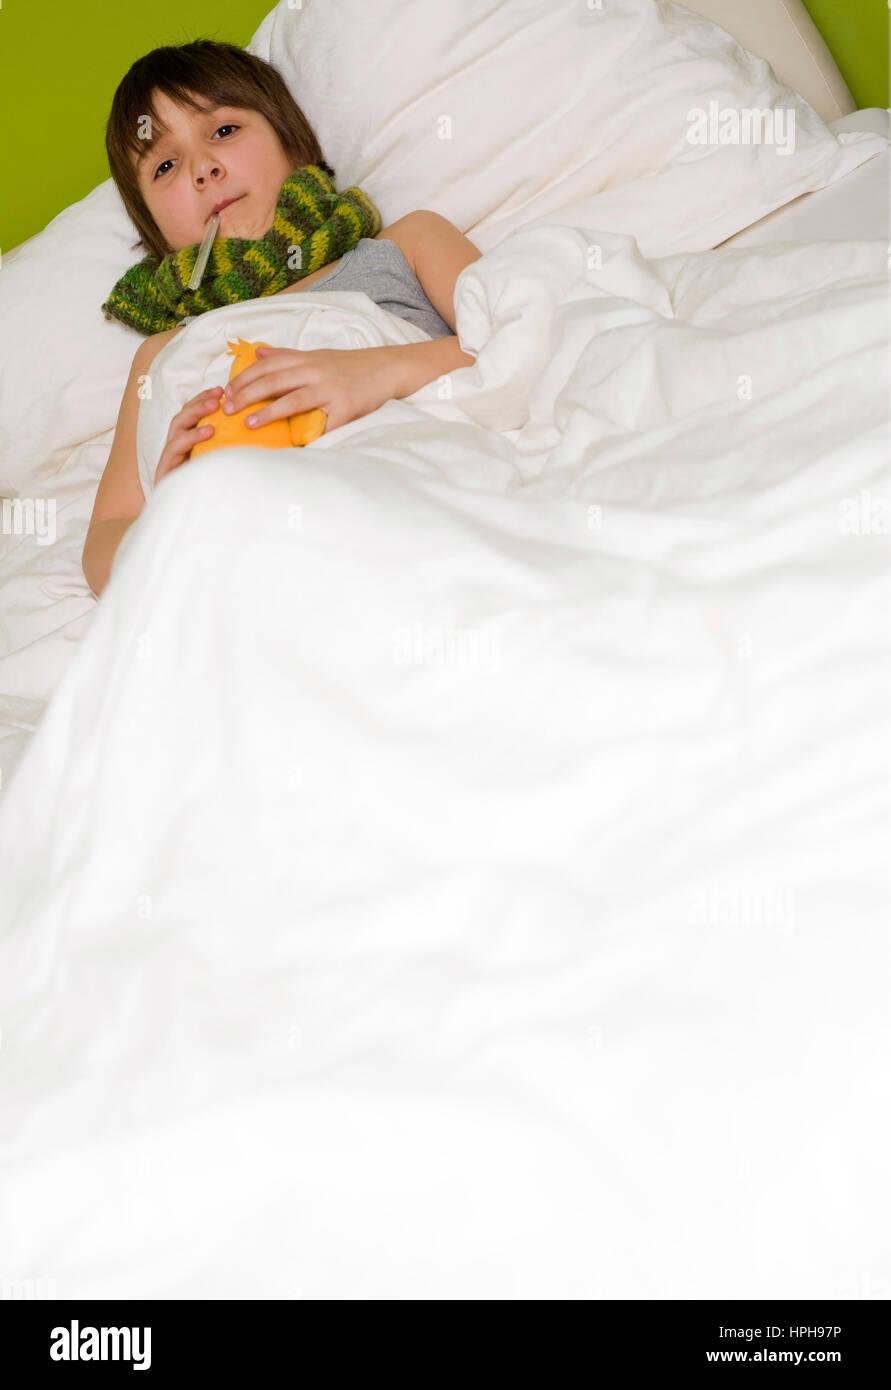 Kranker Junge liegt im Bett - sick boy in bed, Model released Stock Photo